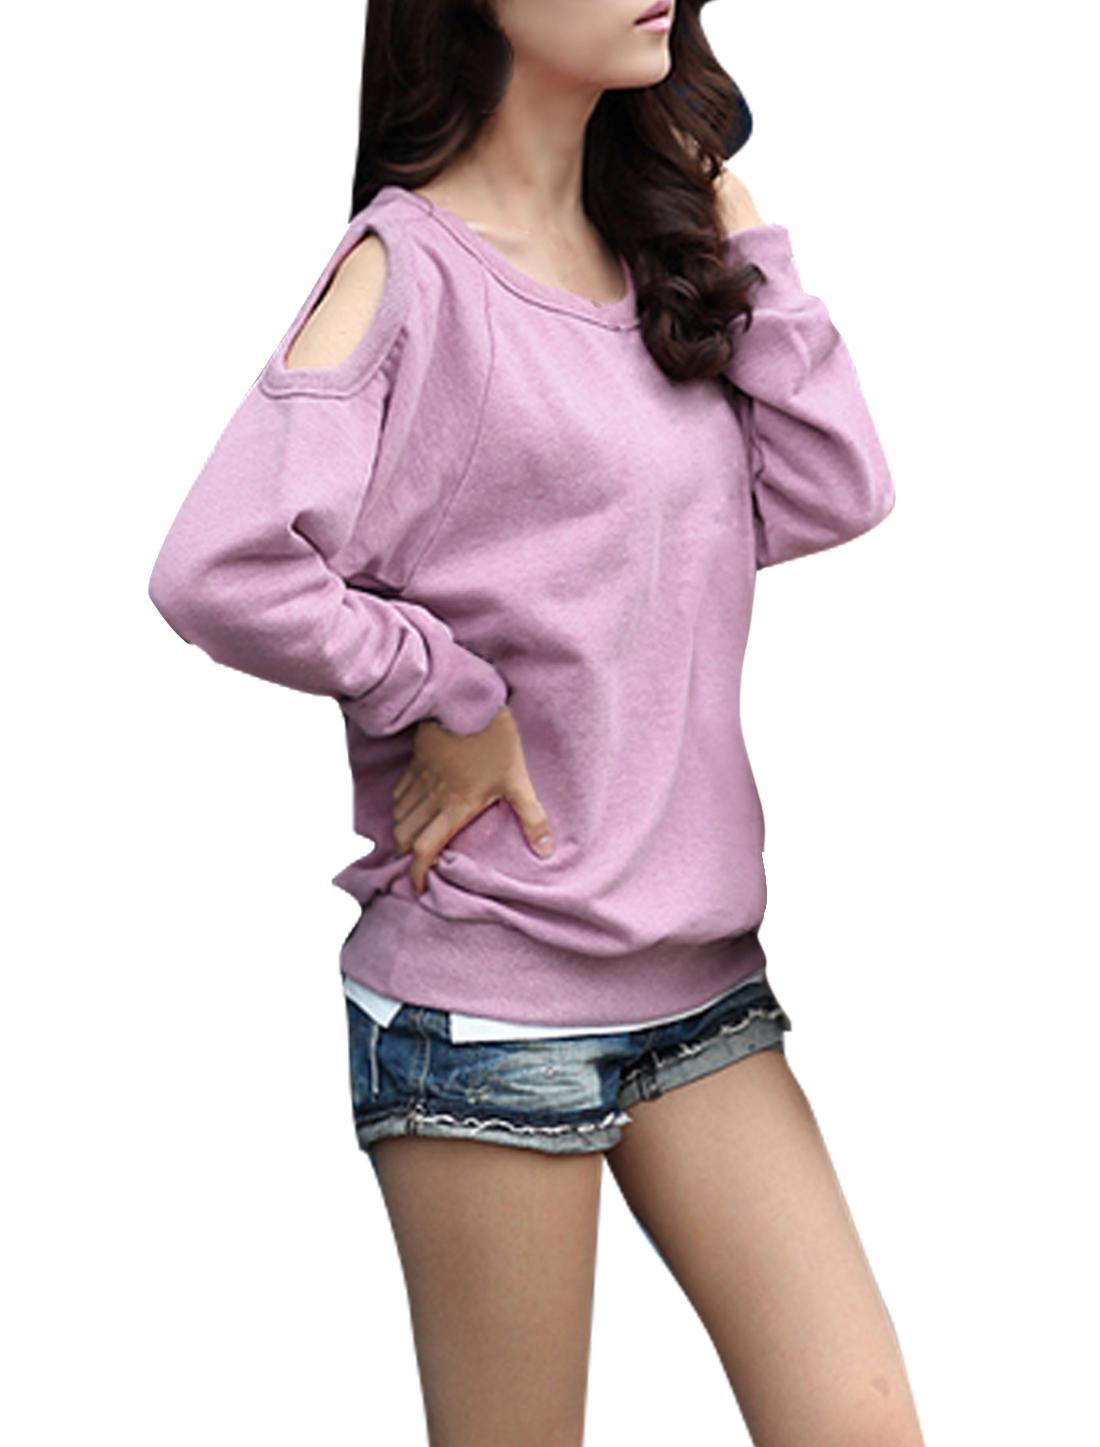 Lady Fashion Long Sleeve Cutout Shoulder Design Lilac Shirt XL